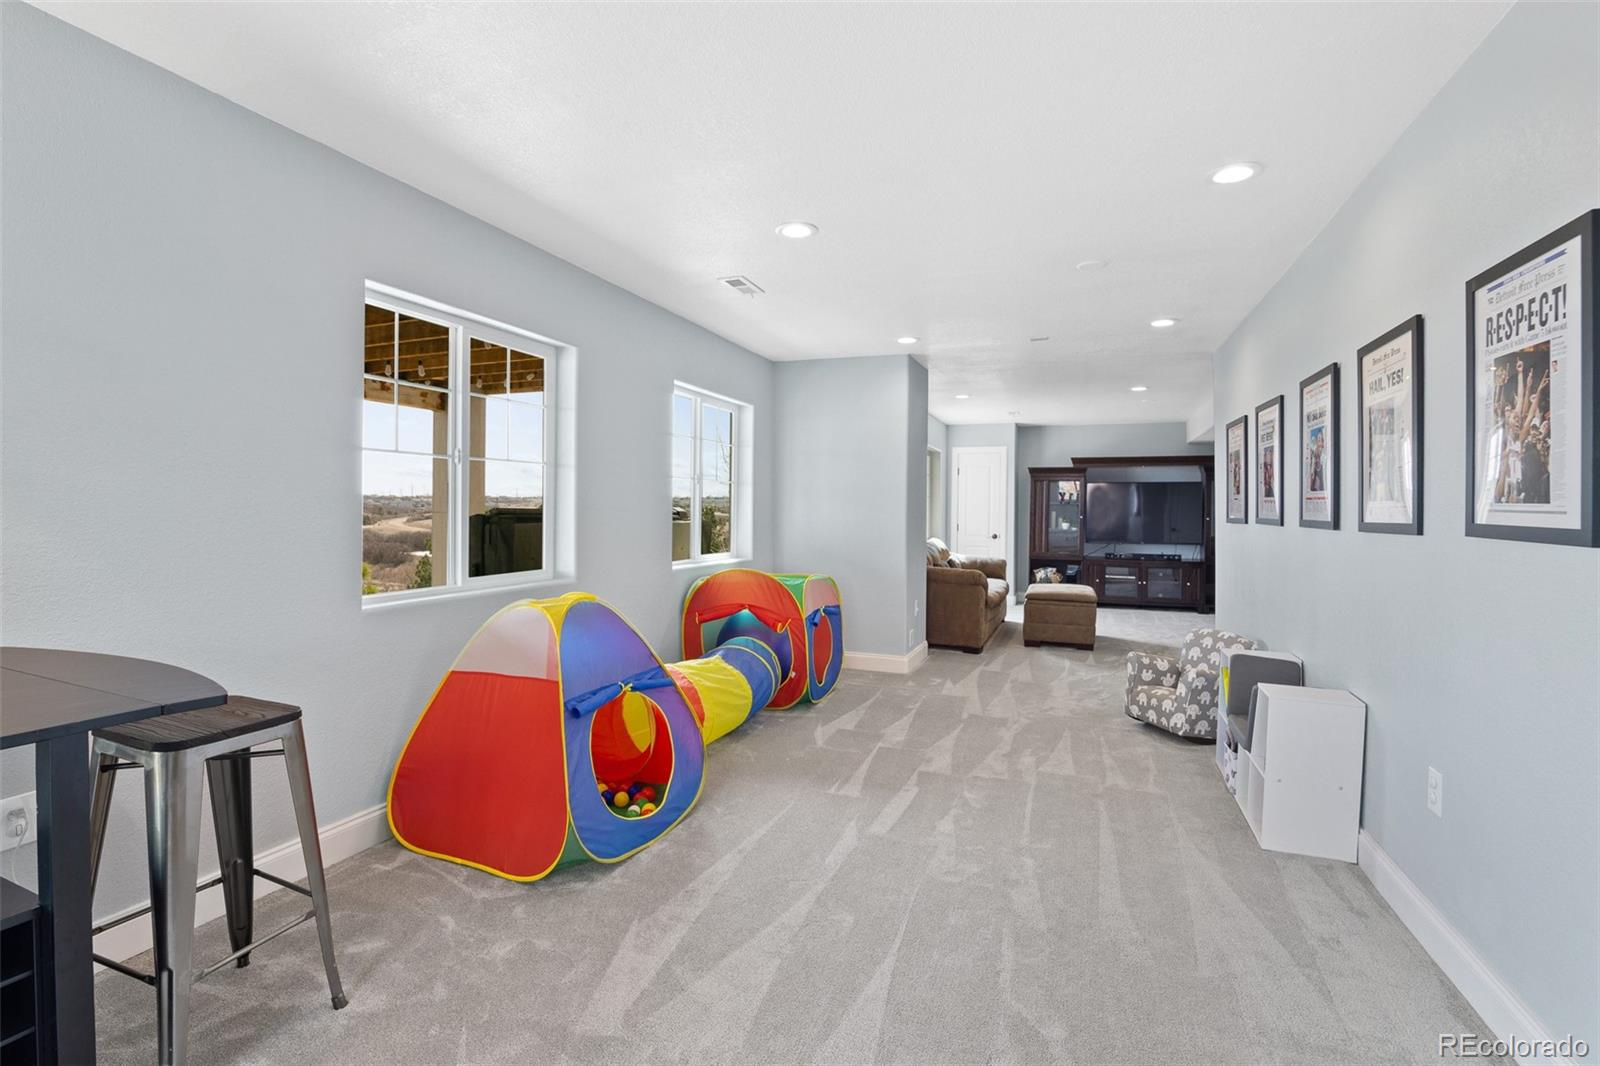 MLS# 3370359 - 35 - 4195 Red Bird Court, Castle Rock, CO 80108